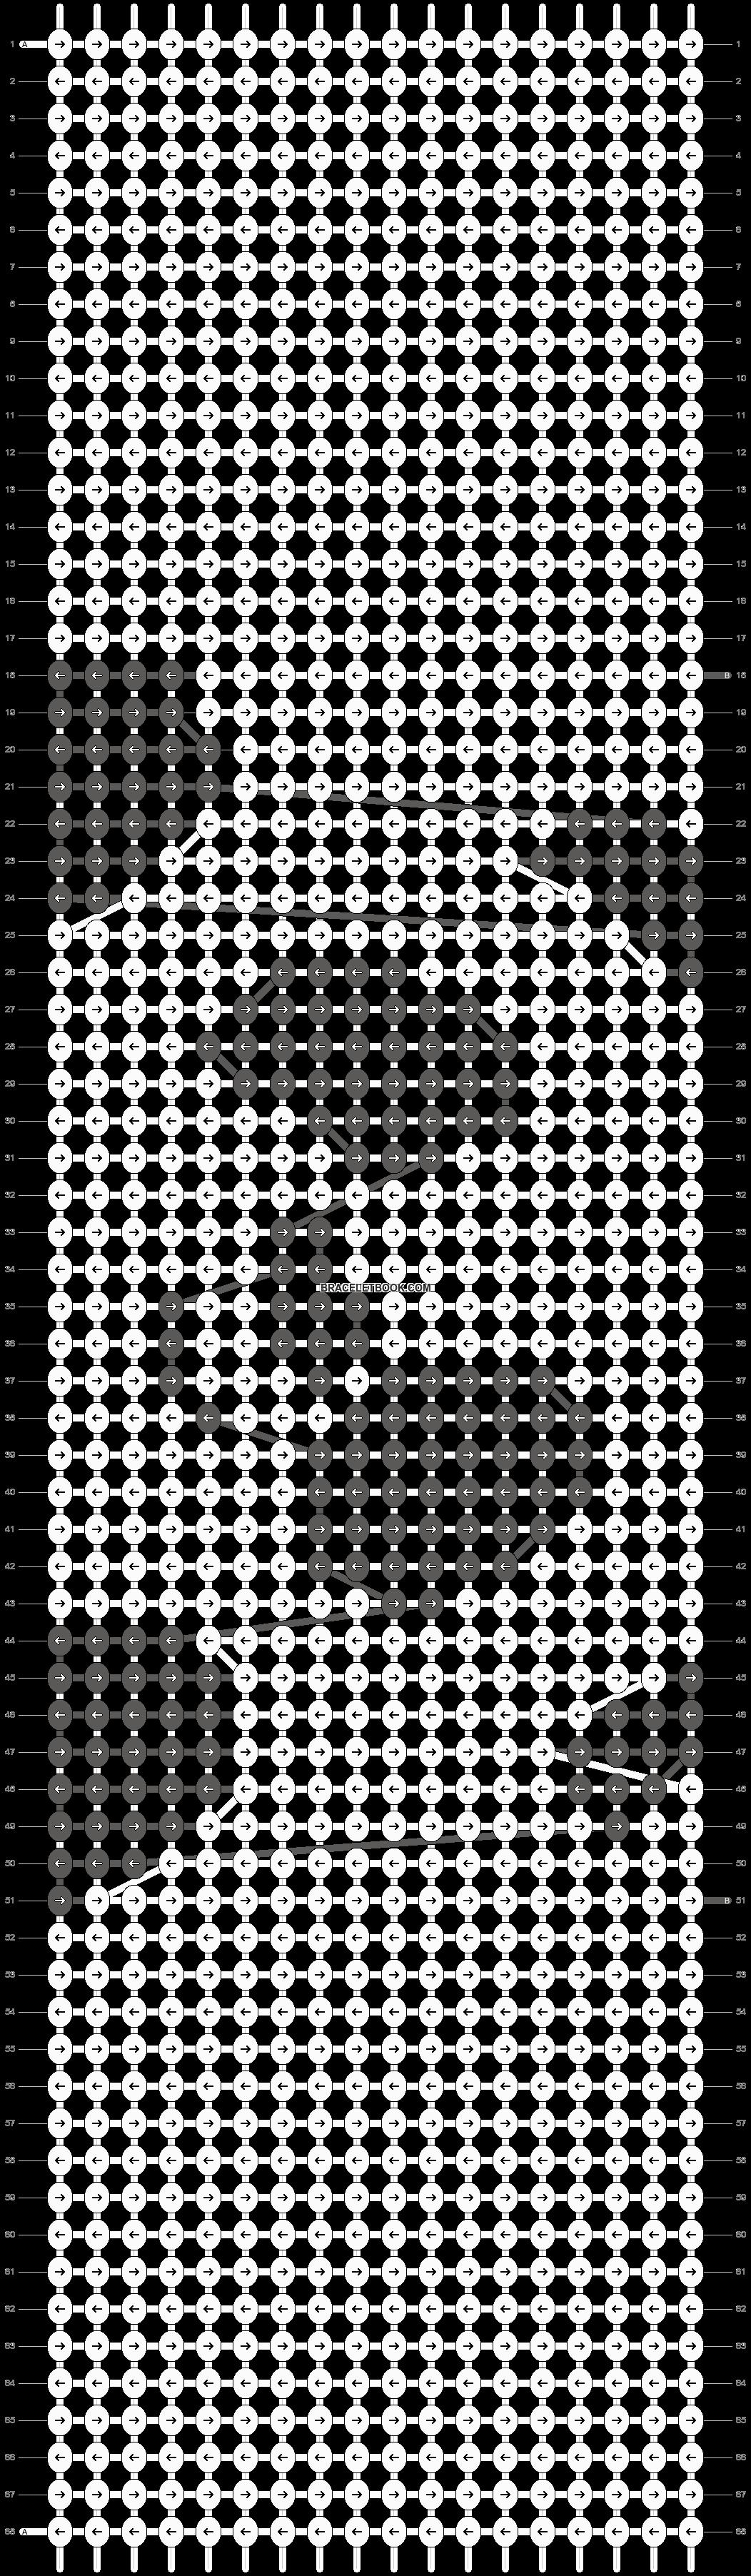 Alpha pattern #90728 pattern